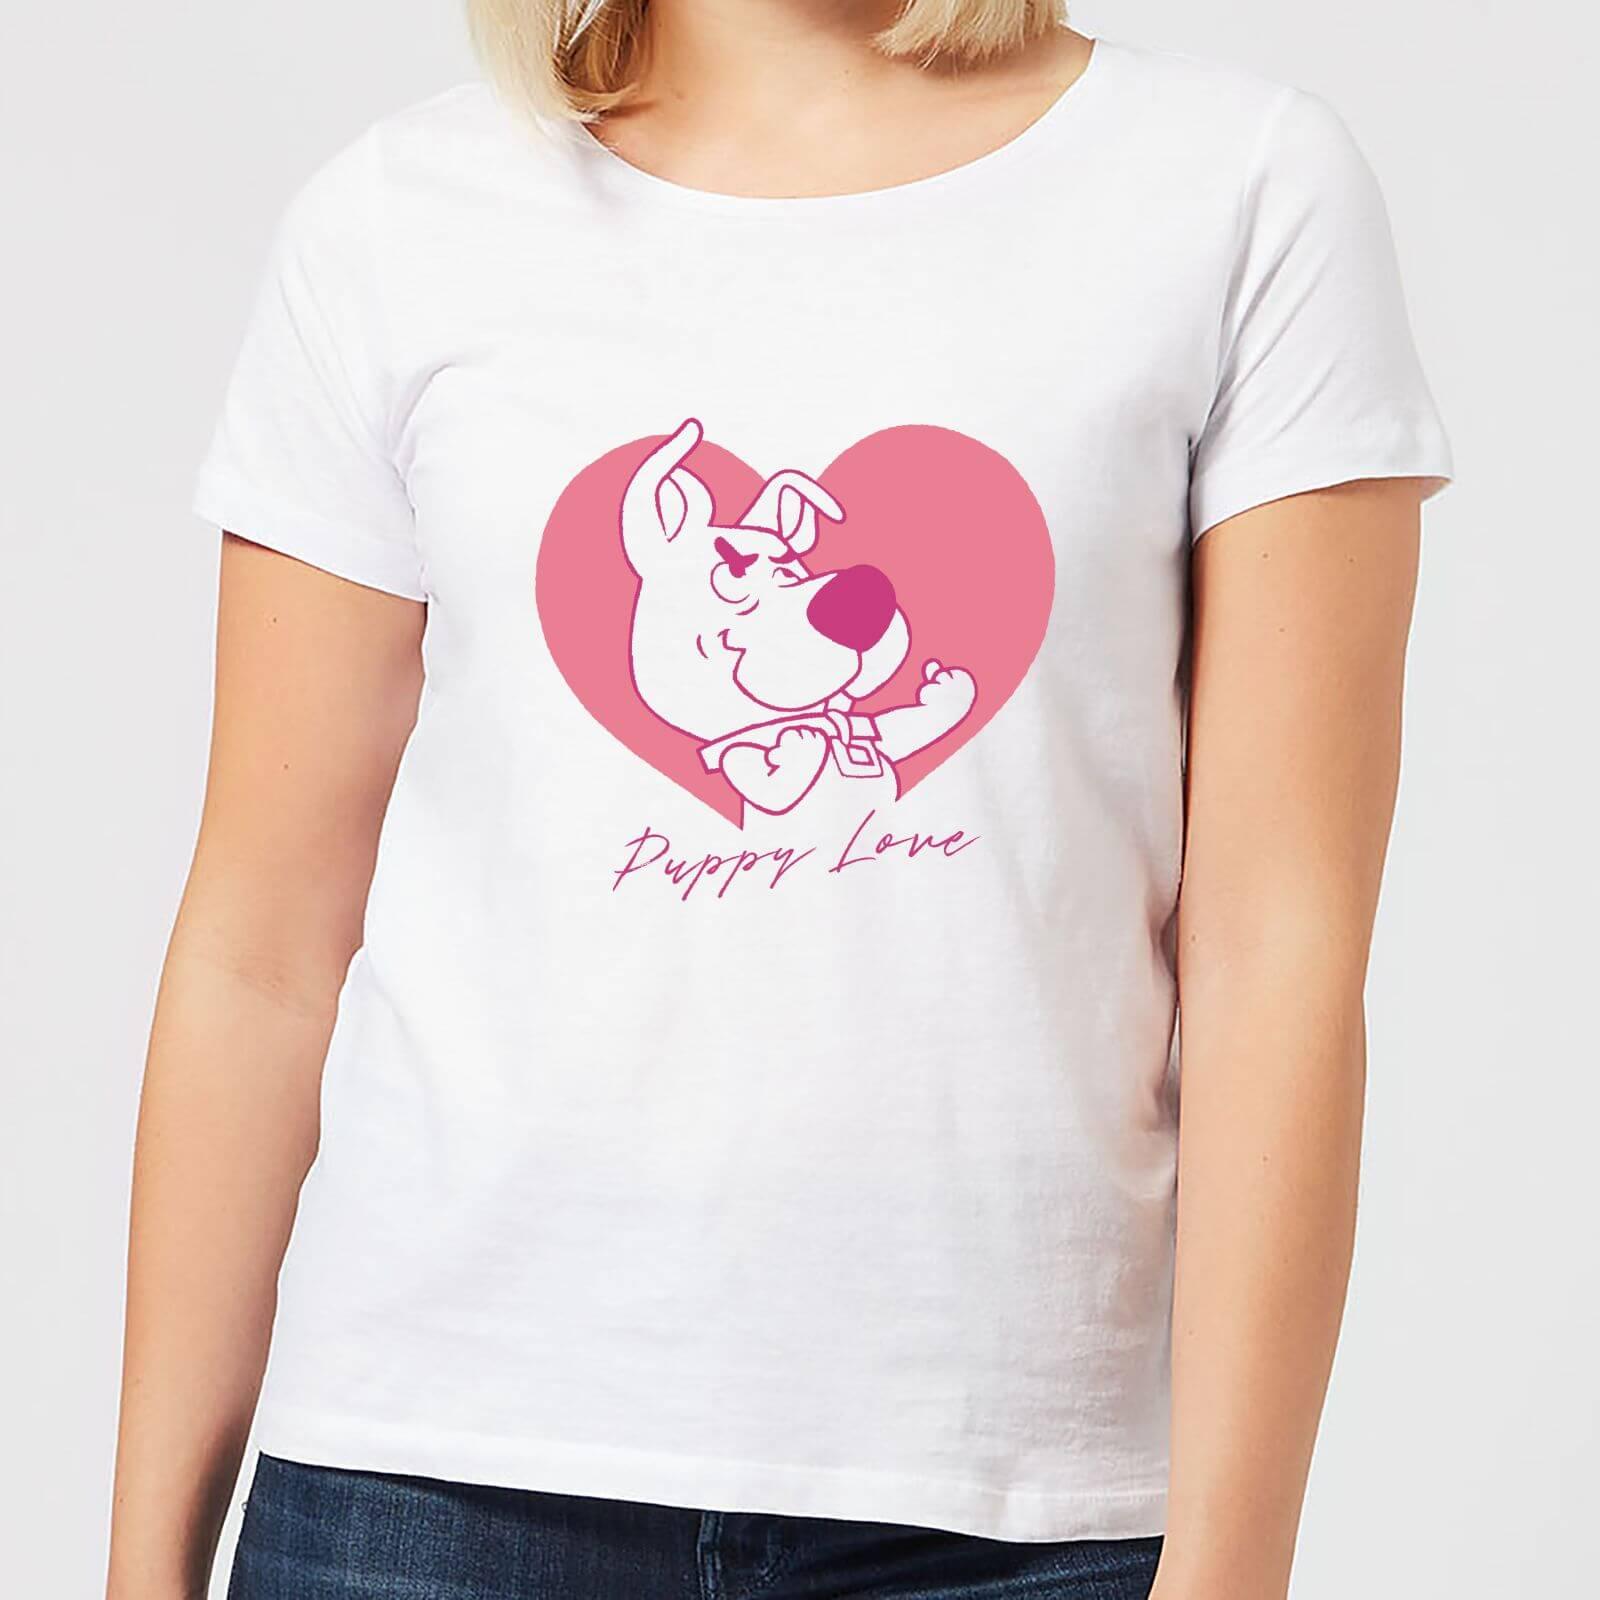 Scooby Doo Puppy Love Women's T-Shirt - White - XL - White